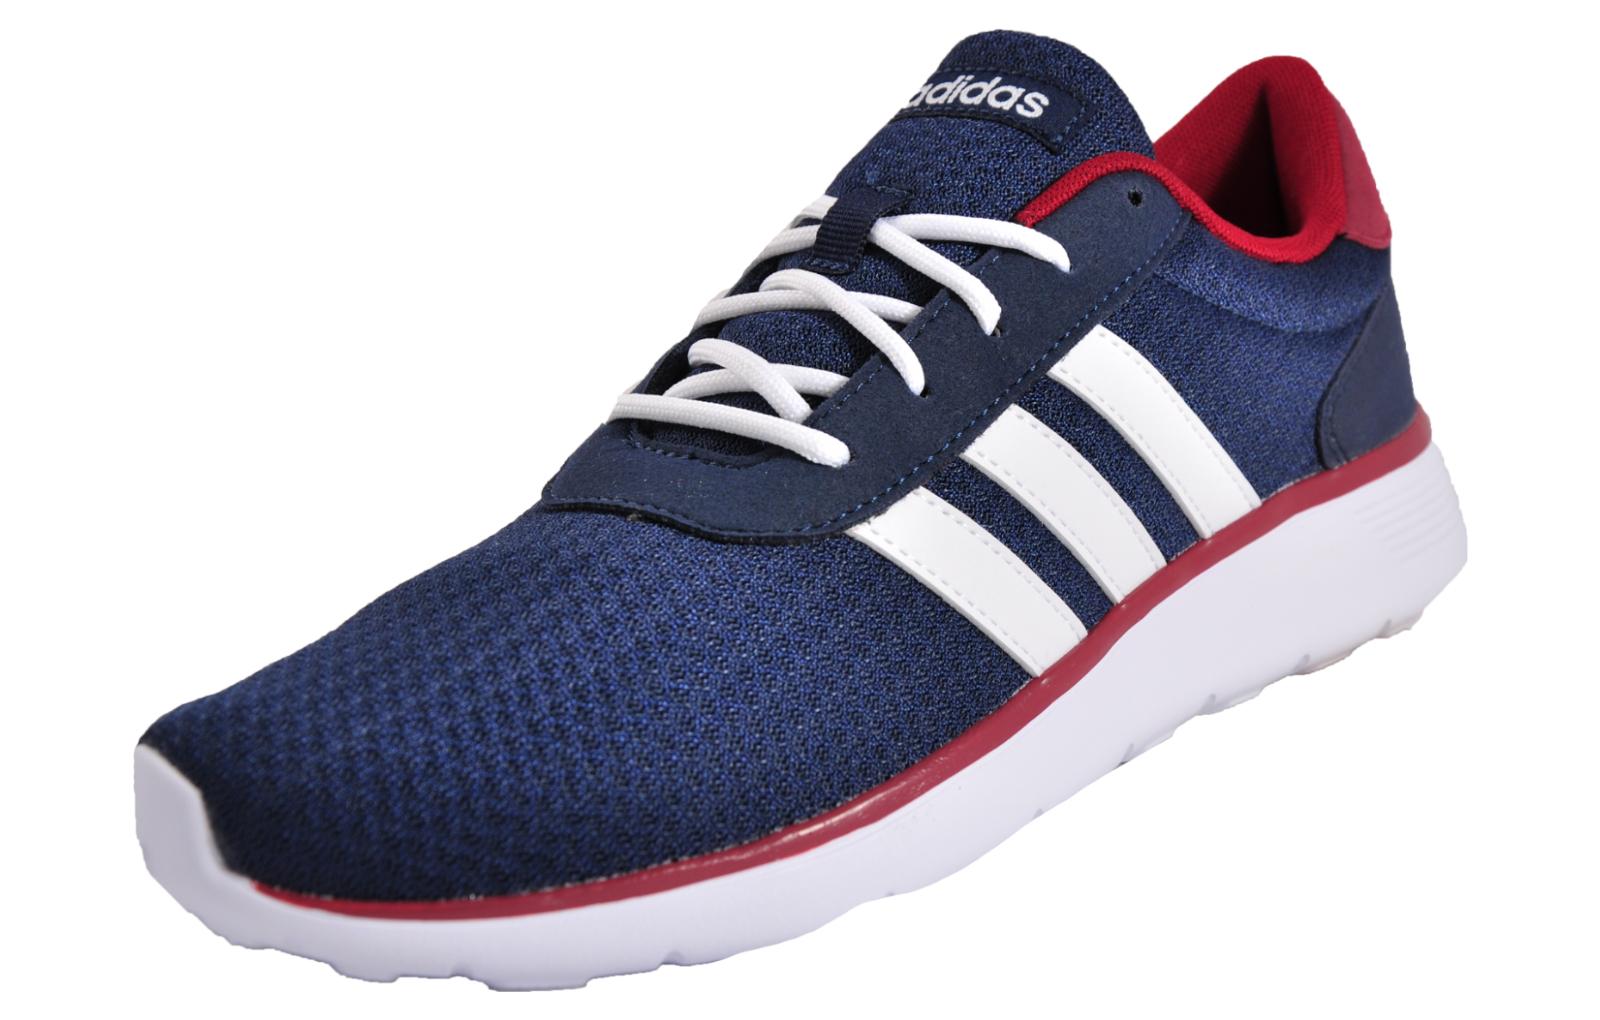 Adidas lite racer trainers for men 42 grey men's shoes